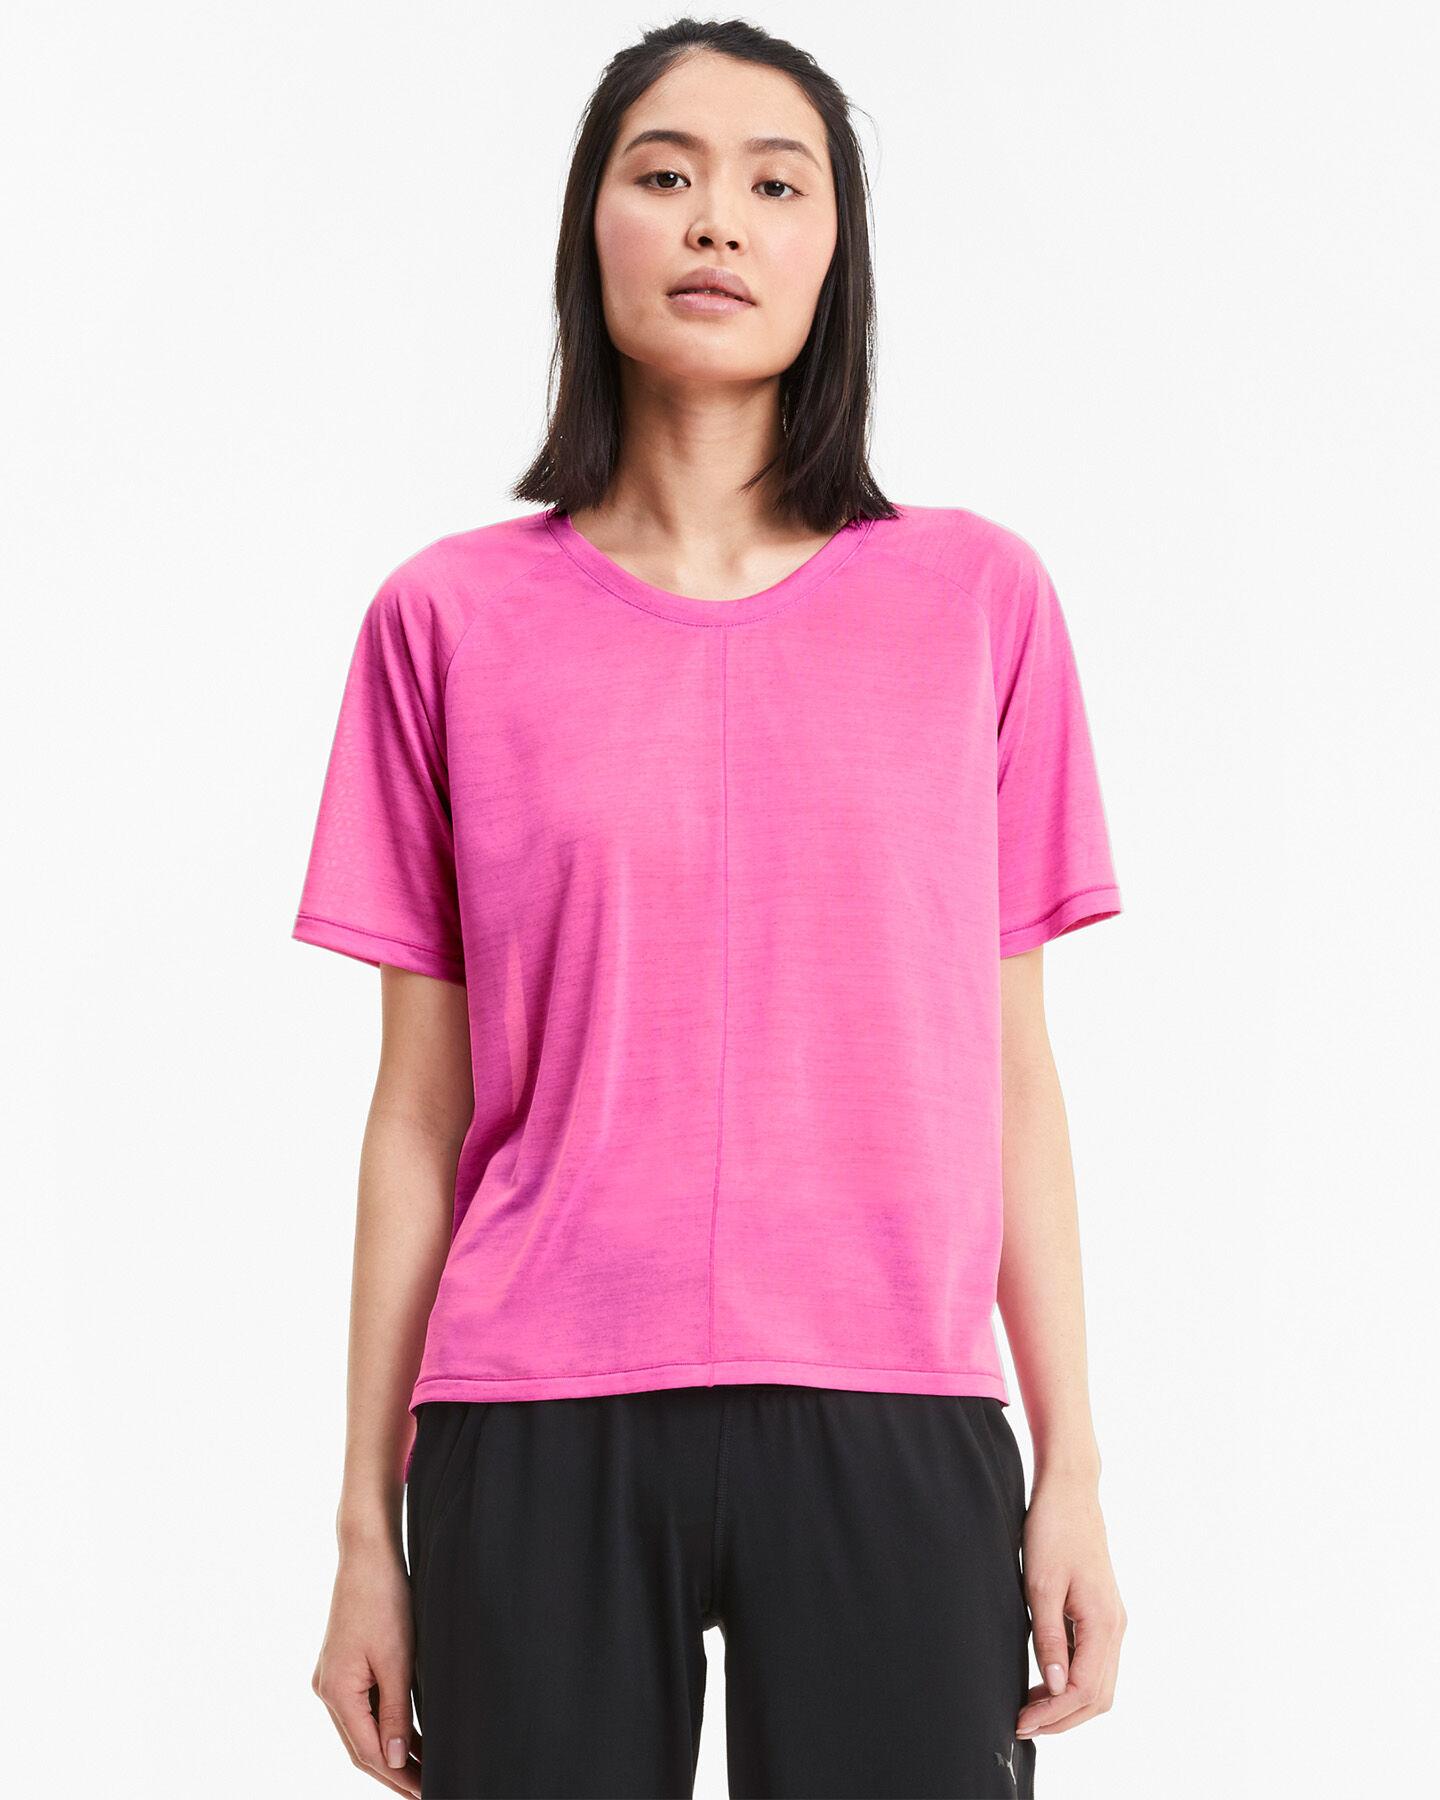 T-Shirt training PUMA DRIFIT LOGO W S5234838 scatto 2